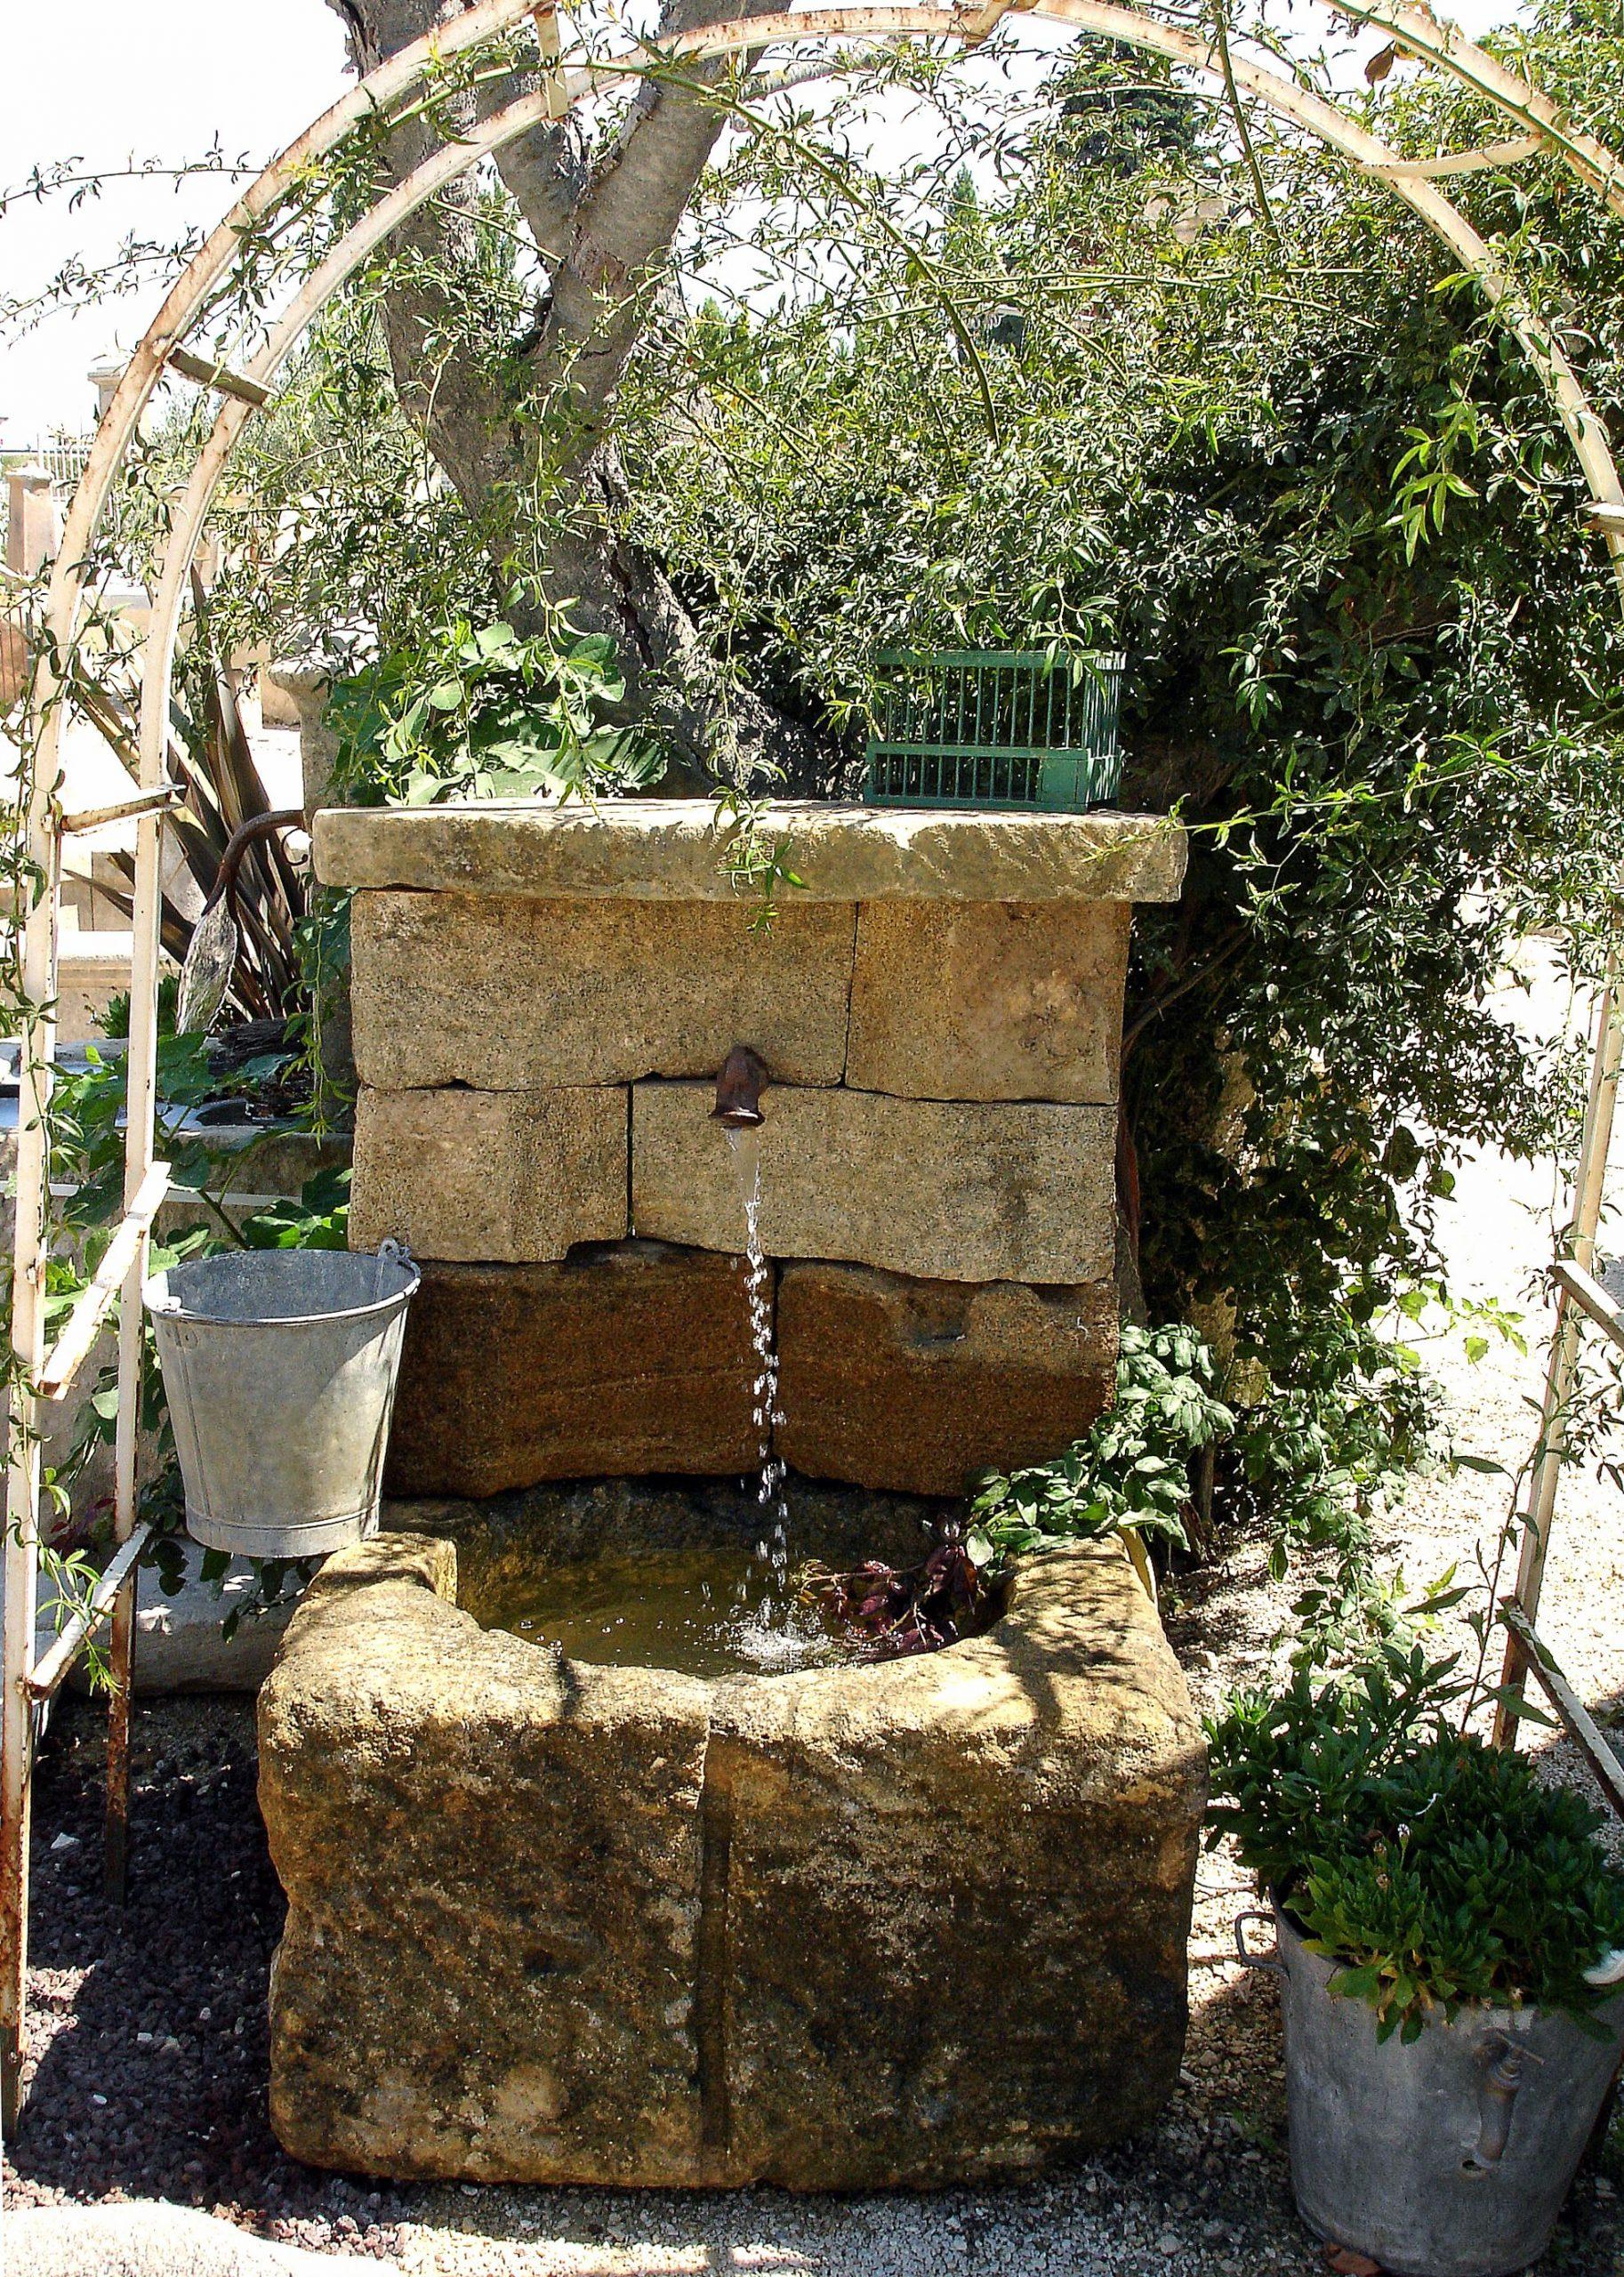 Atelier Alain Bidal #atelierbidal : Fabrication Artisanale ... tout Construire Fontaine De Jardin